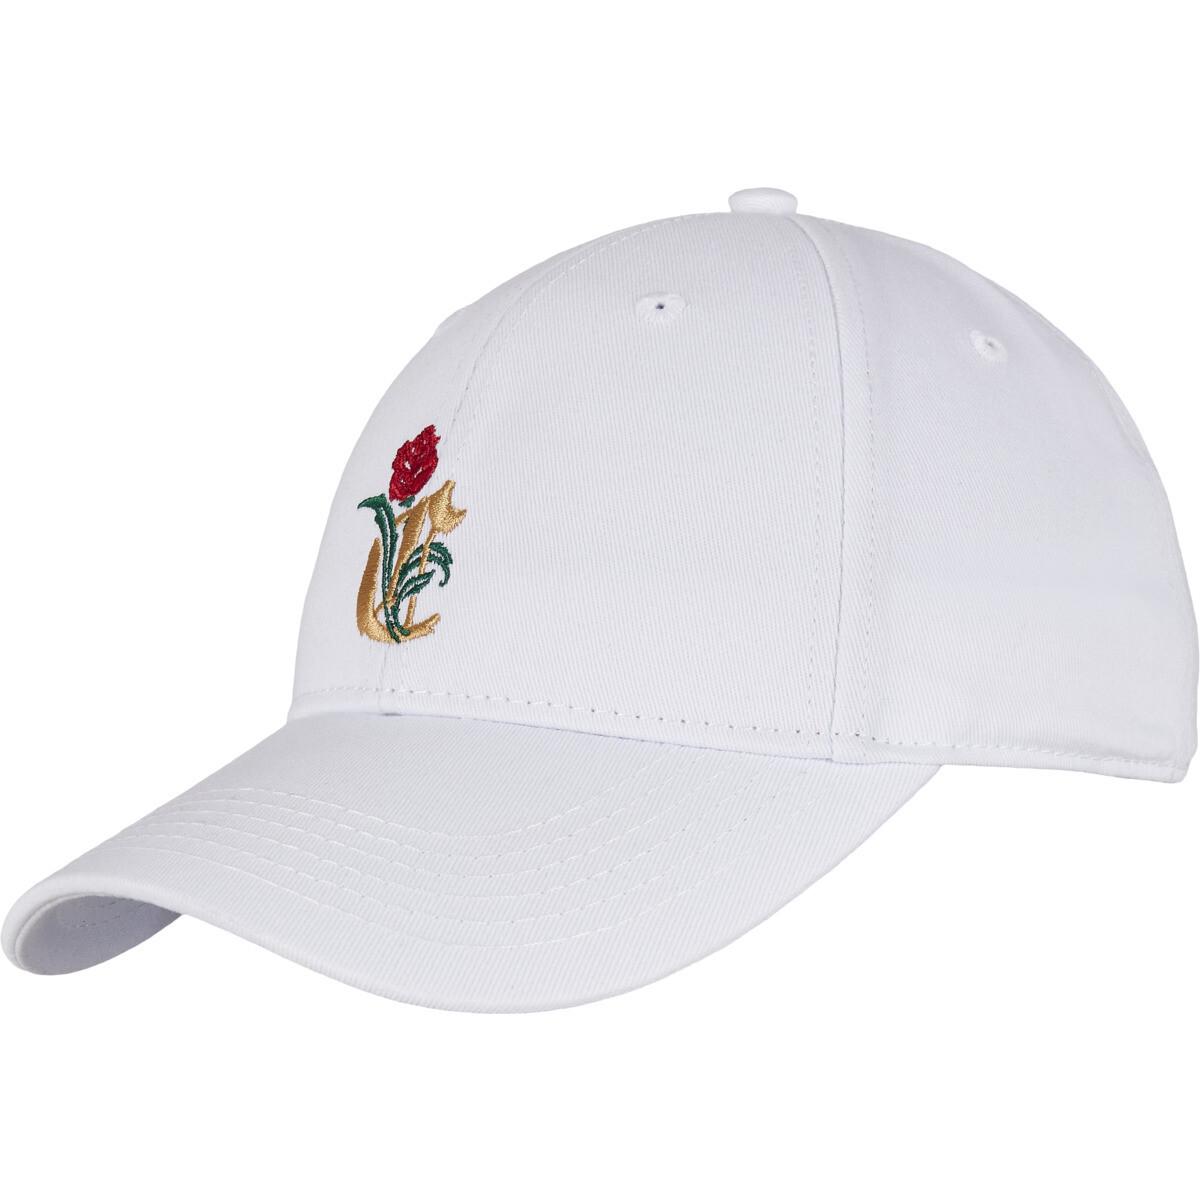 C&S WL Royal C Curved Cap